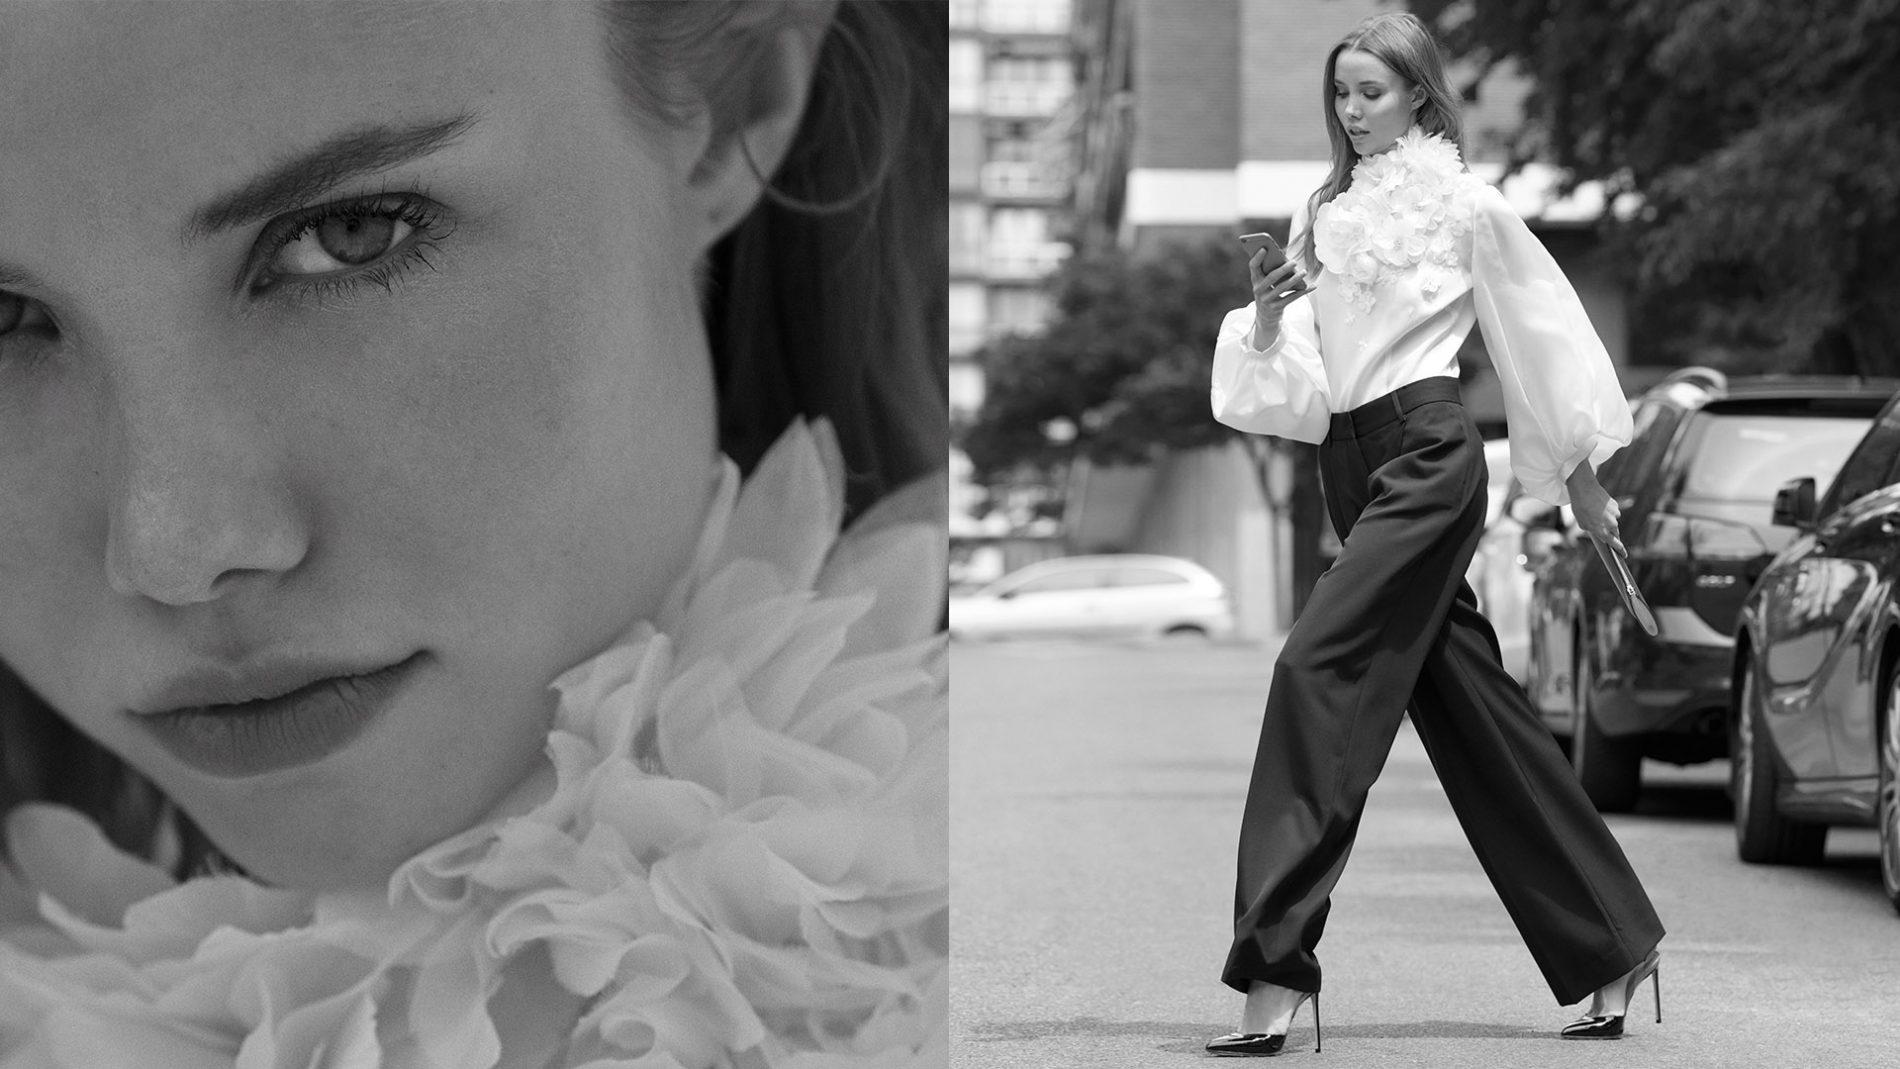 El Corte Inglés Ready-To-Wear Designer Shoes Victoria Beckham Lanvin Andrew Gn Francesco Russo